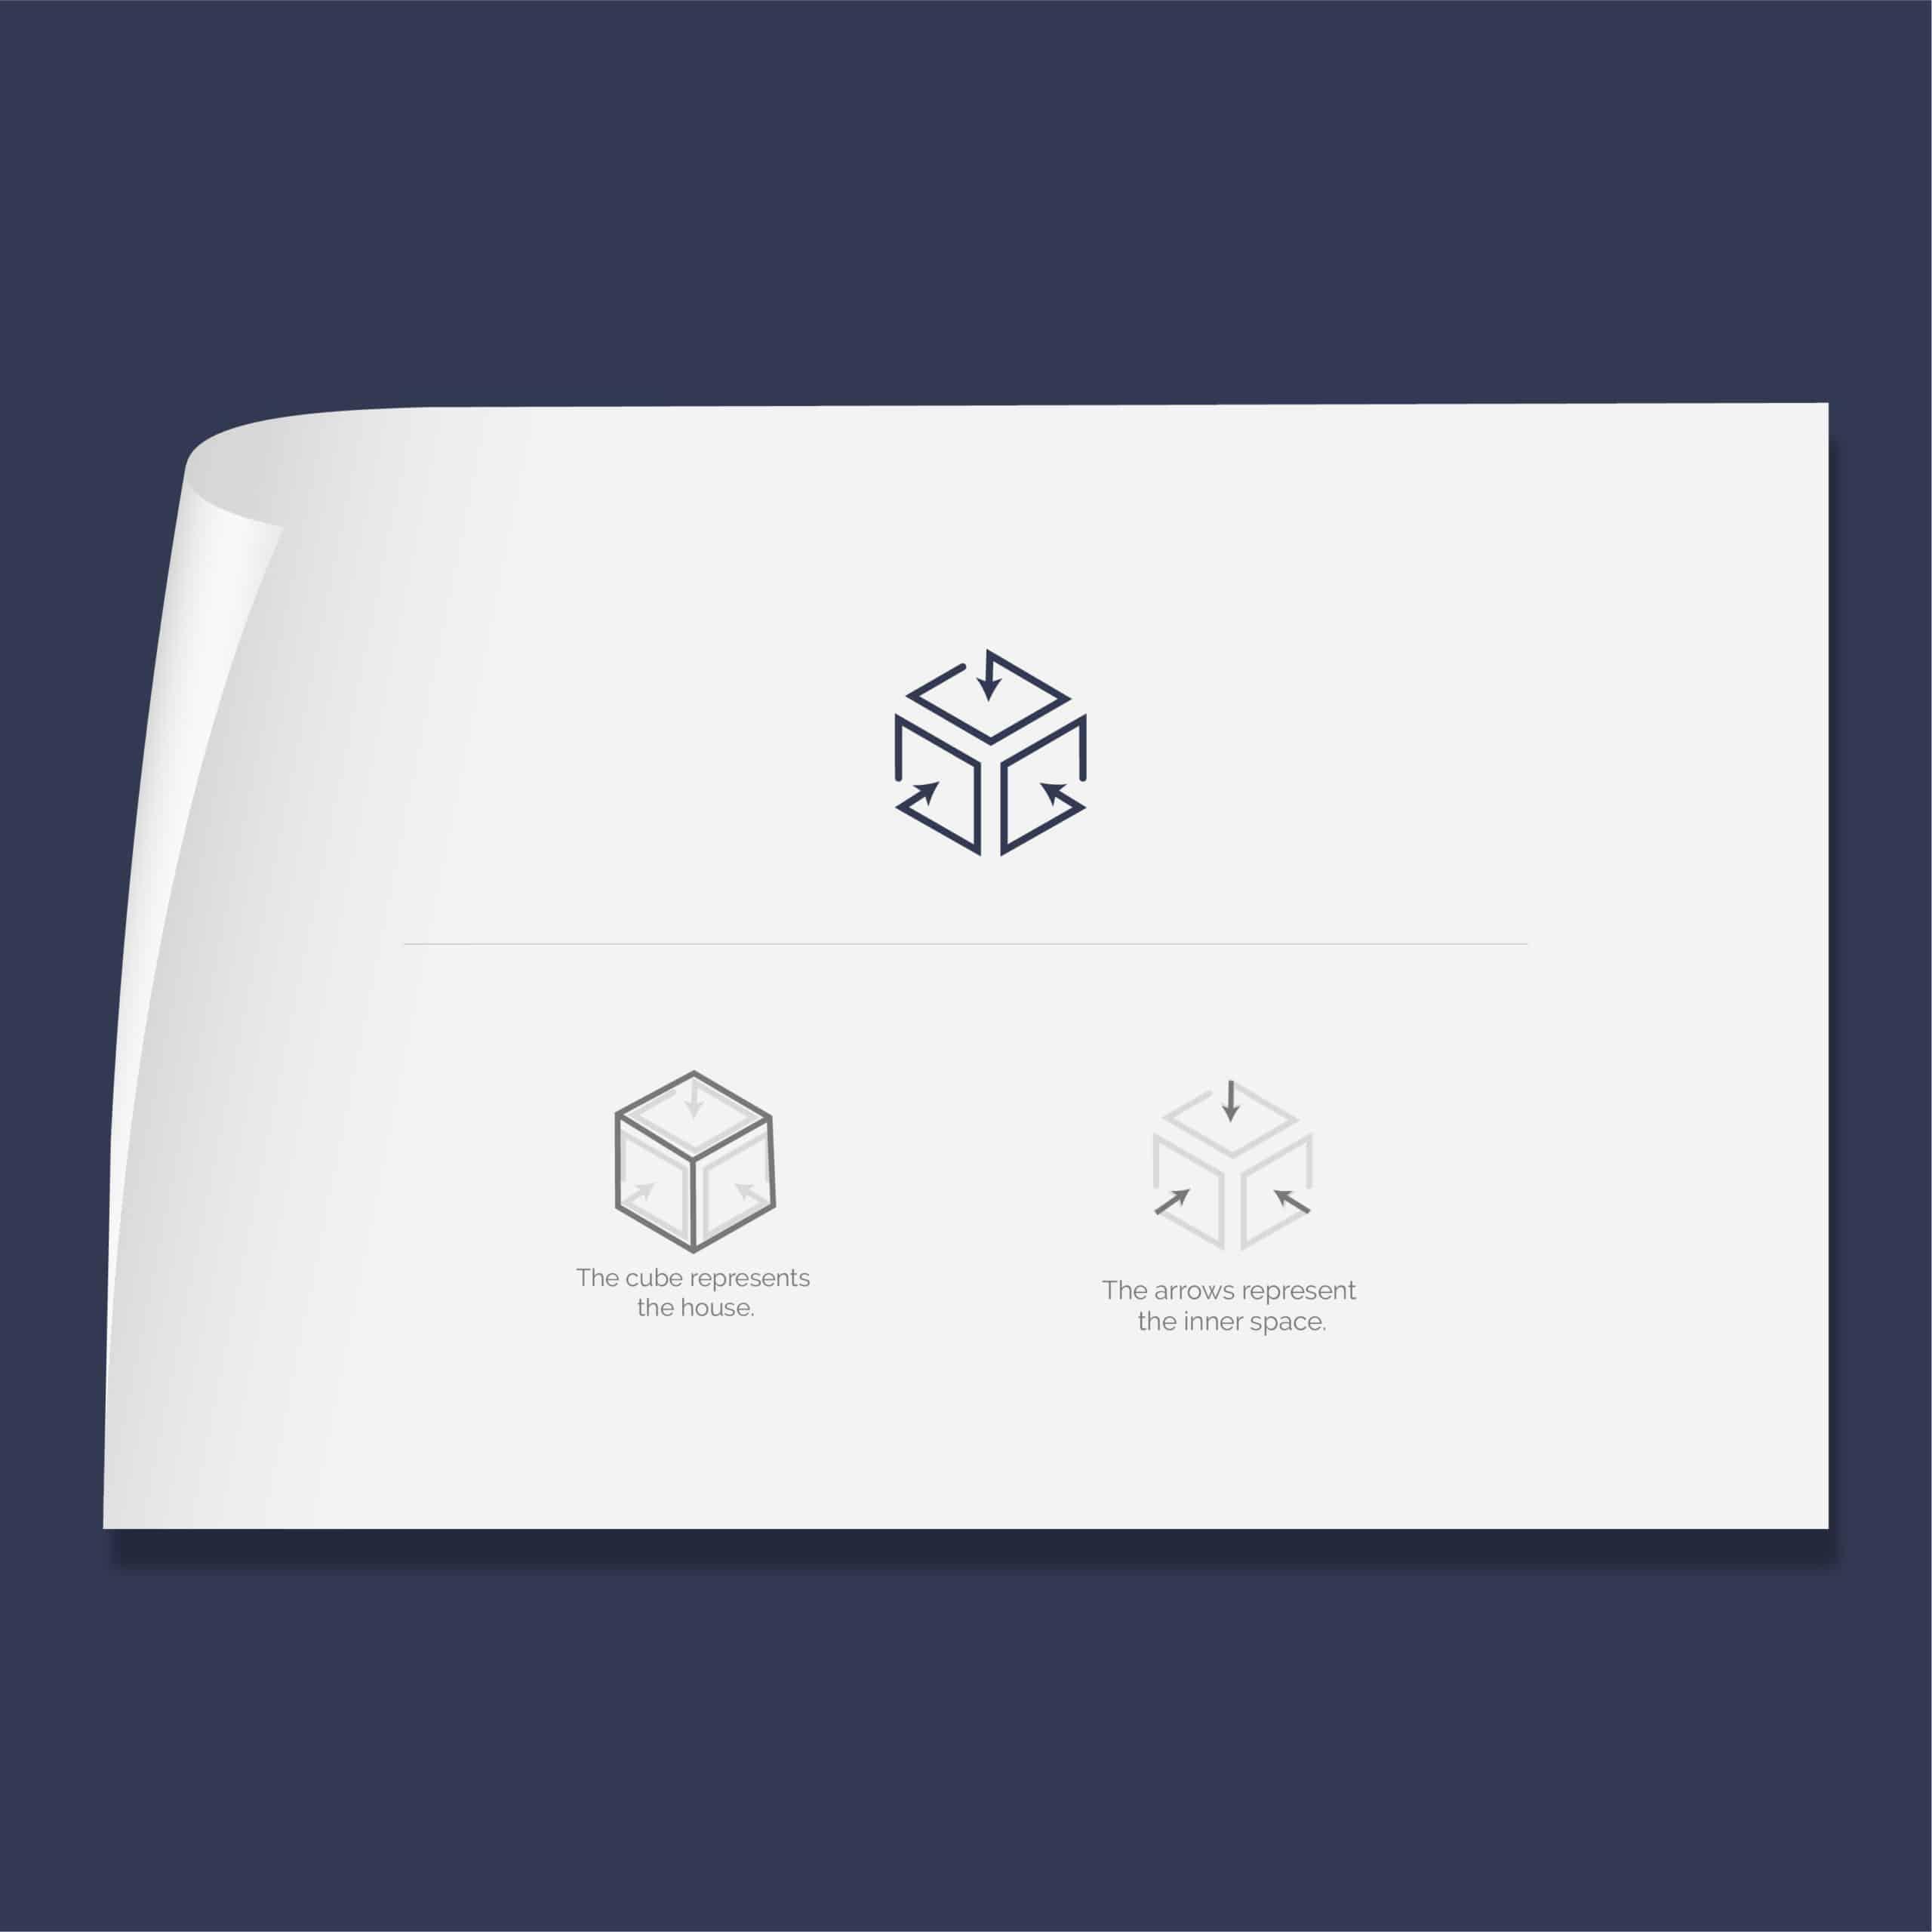 https://horizonplus.eu/project/branding-and-identity-kompas-interior-design/